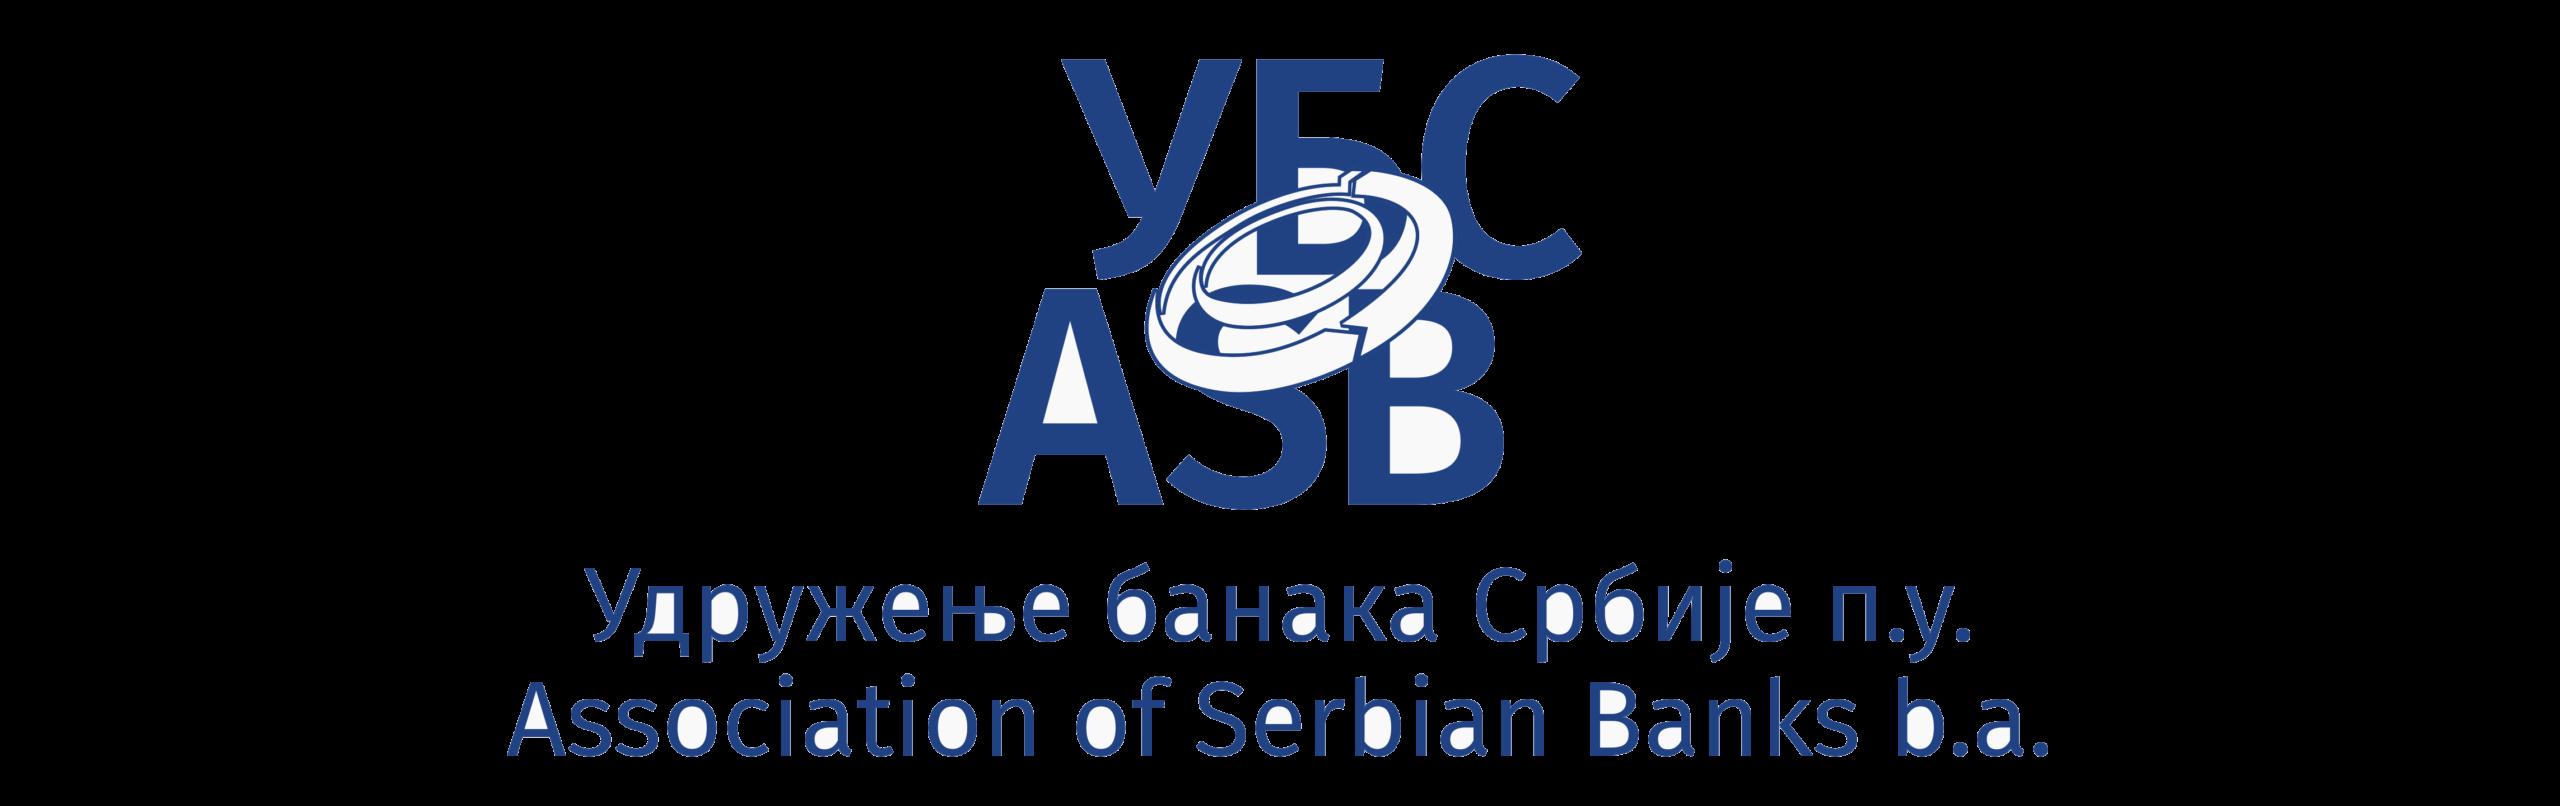 UBS-logo-1-e1595839714994.png